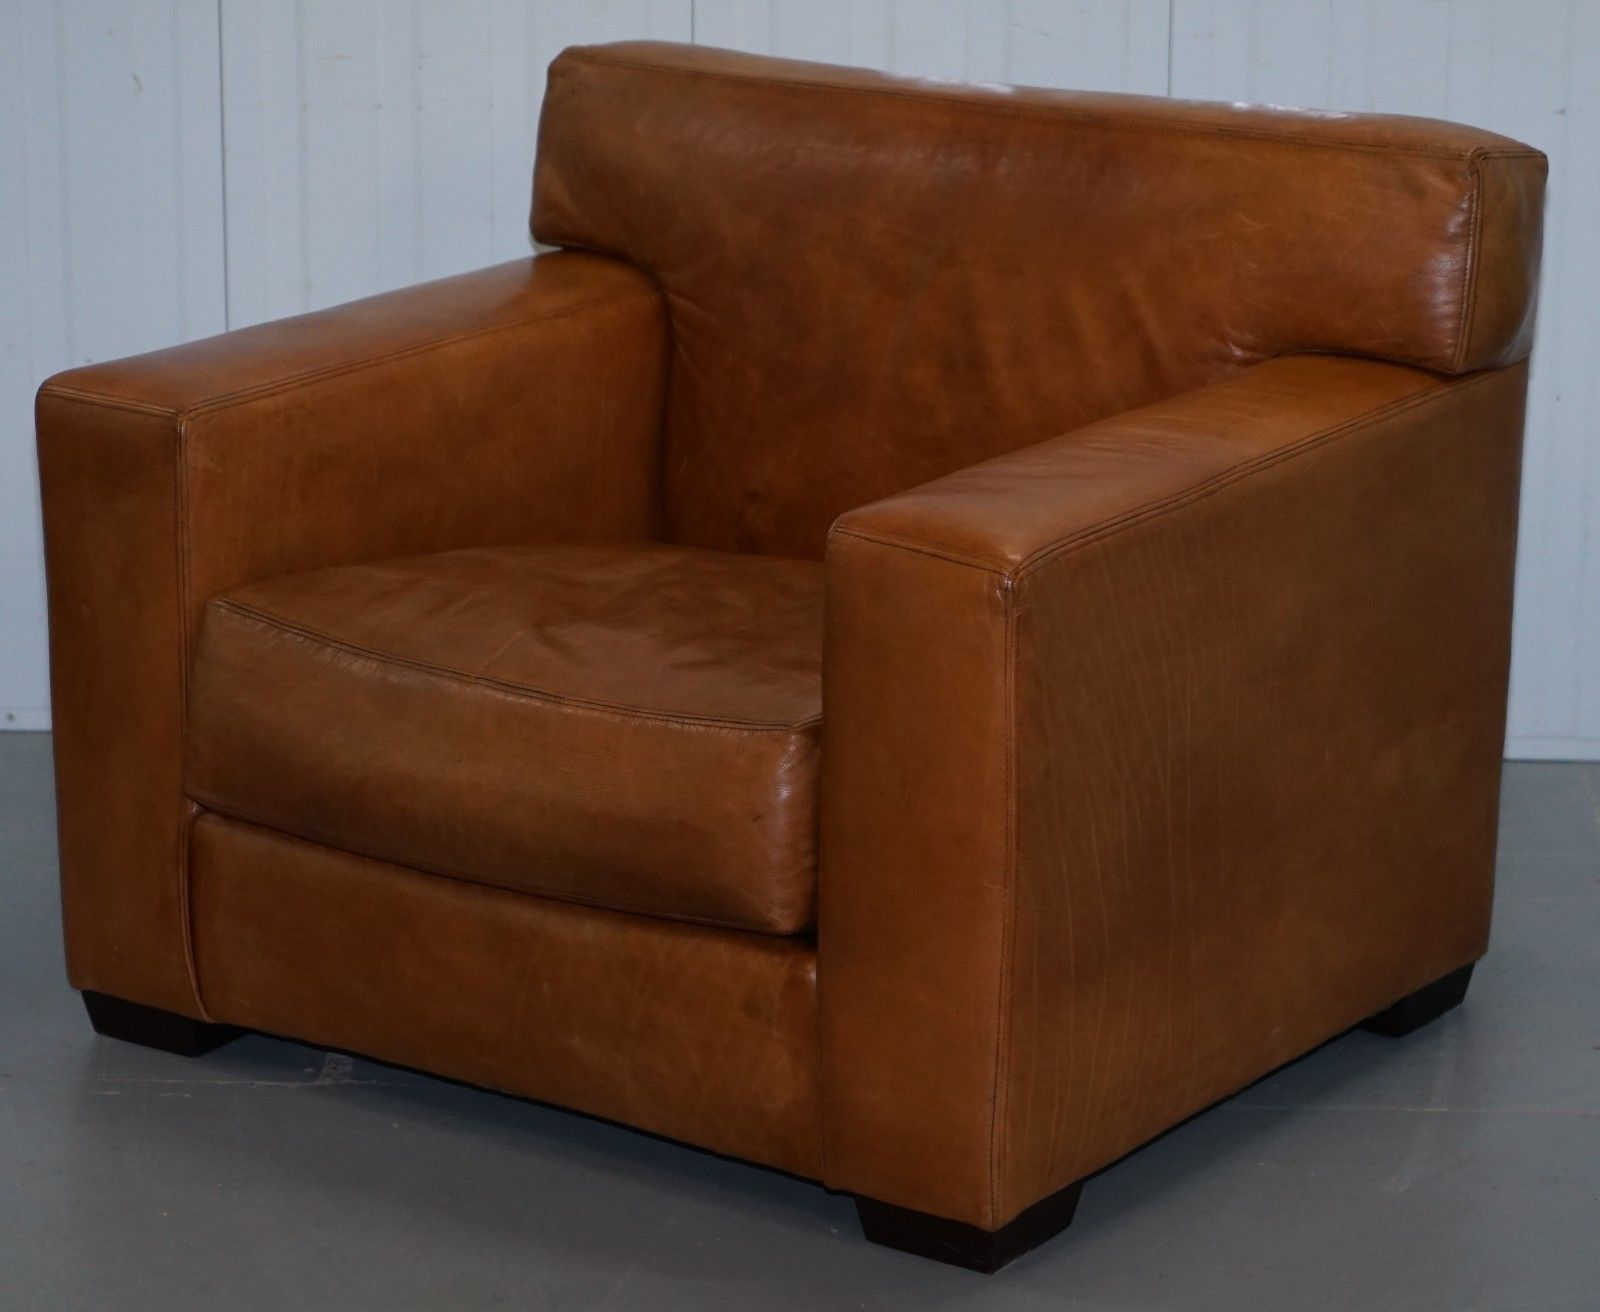 Ralph Lauren Graham Club Armchair Tan Brown Custom Buffalo Leather In 2019 Armchair Furniture Design Retro Furniture